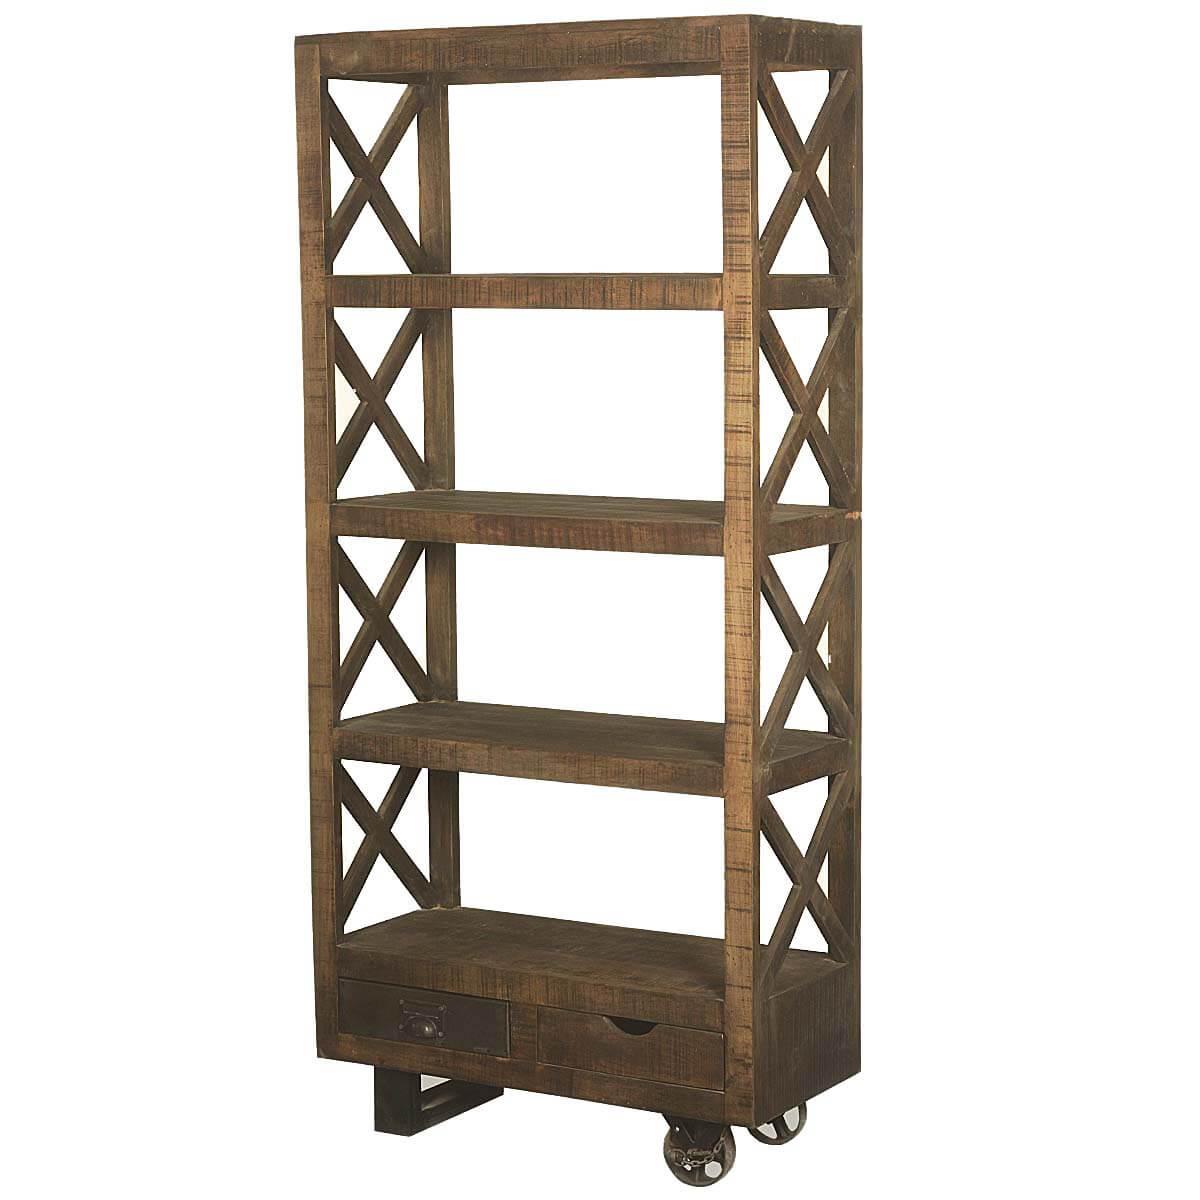 Tower Mango Wood Rolling 76 4 Shelf Bookcase W 2 Drawers